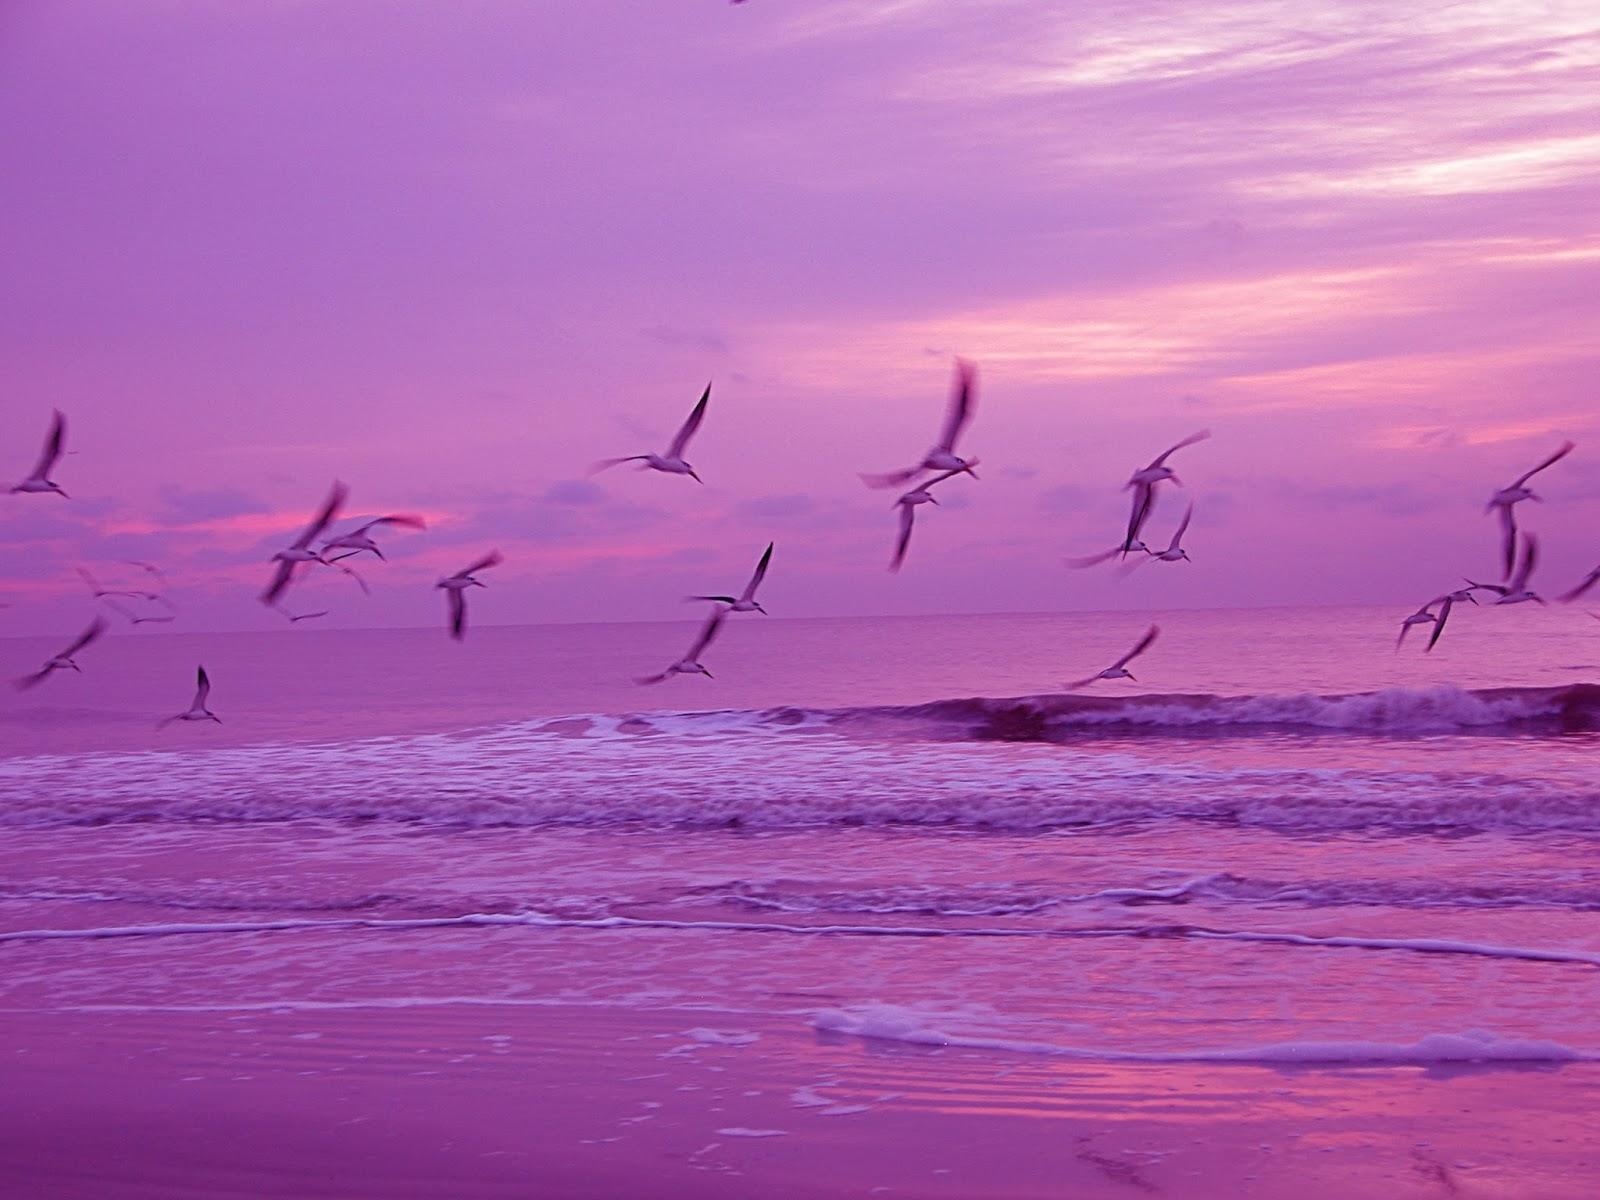 Wallpapers Hd Flying Birds Apple Animals Blue Sky Desktop: Flock Of Birds Sky Bokeh (35) Wallpaper